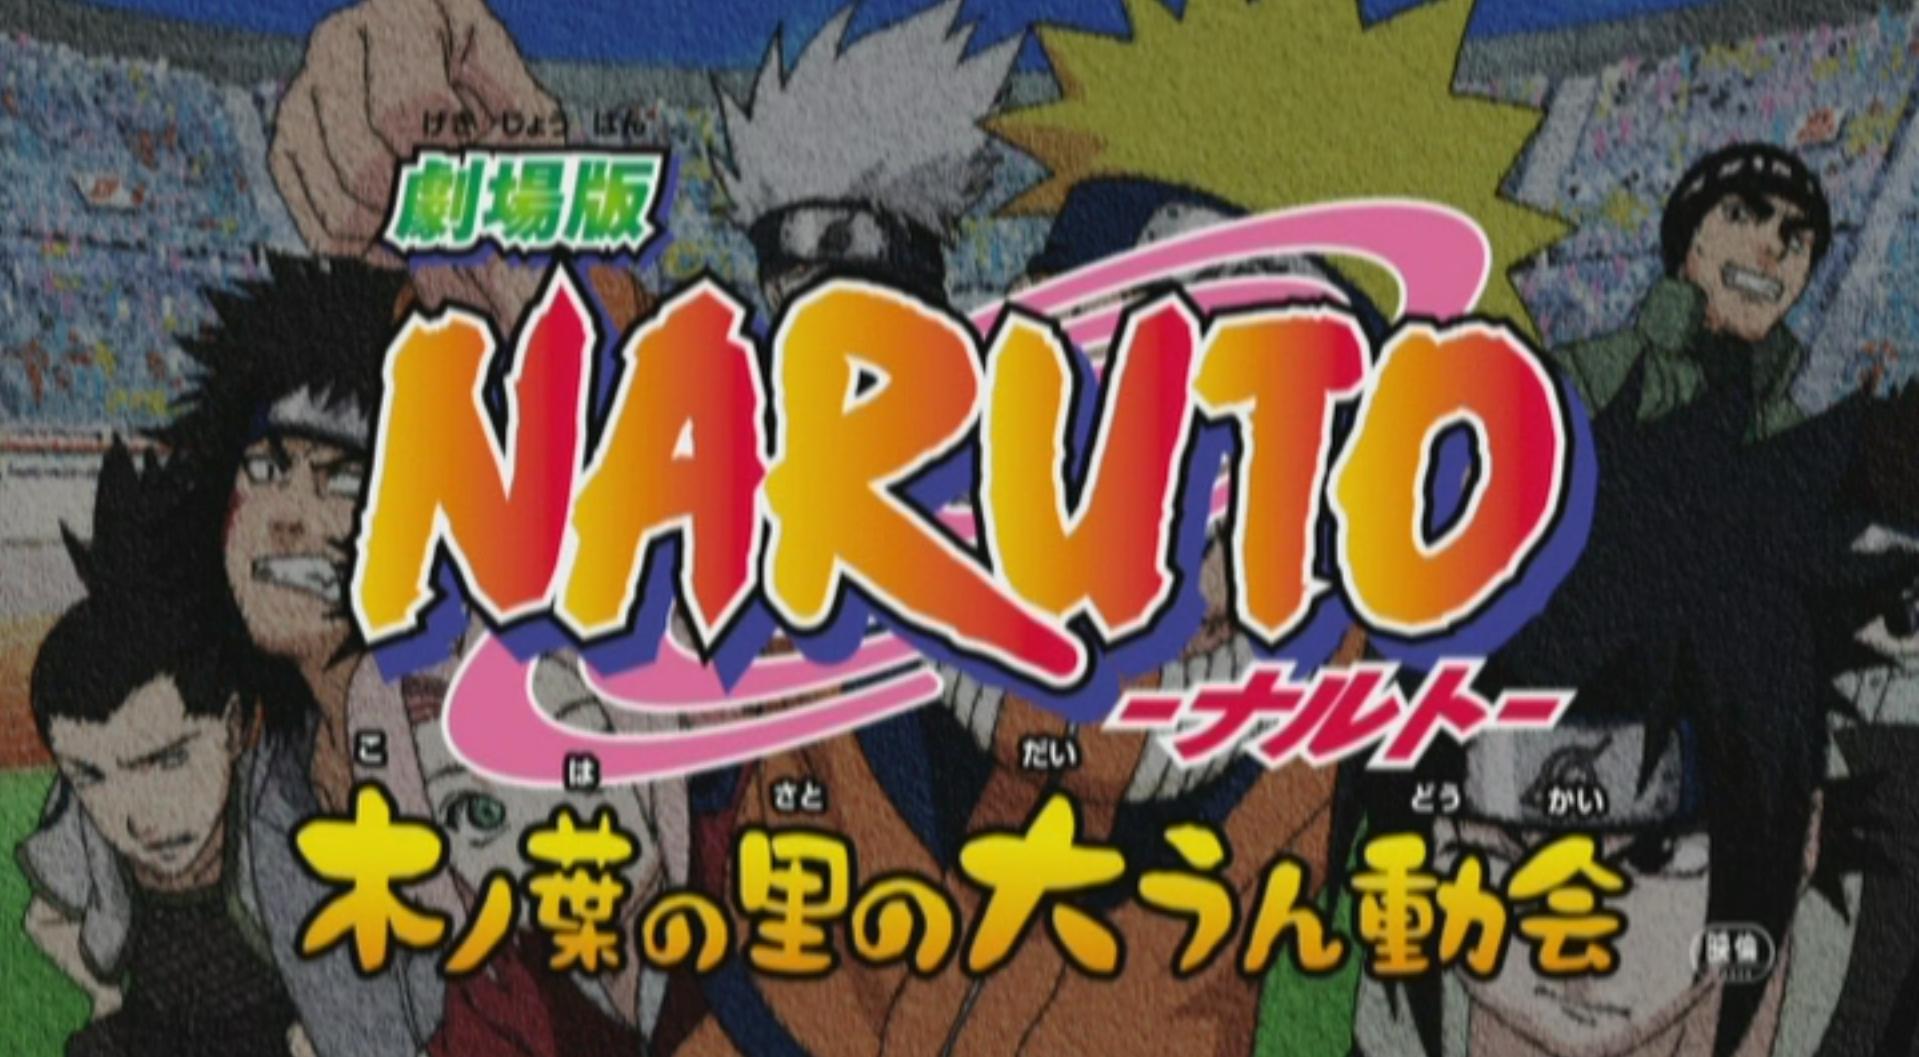 Naruto: Hidden Leaf Village Grand Sports Festival - Production